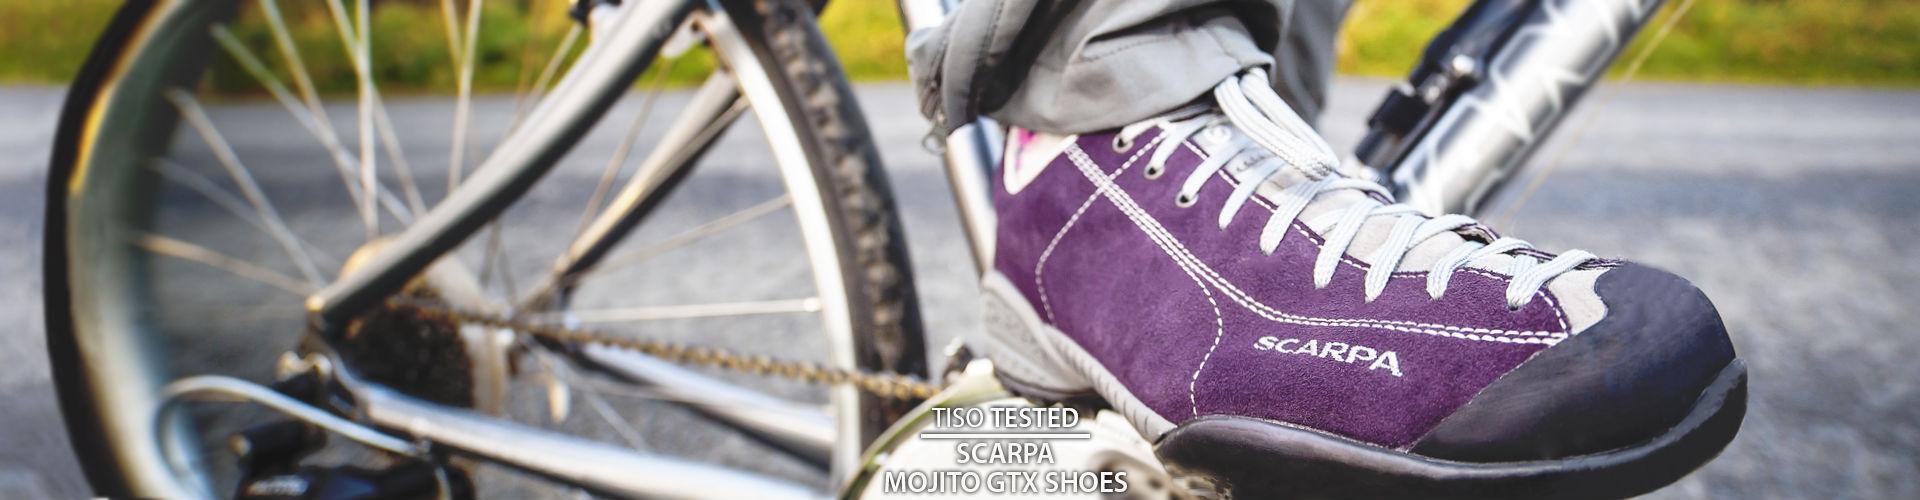 91ec5919df0 Scarpa Mojito GTX - Tested by Tiso | Tiso